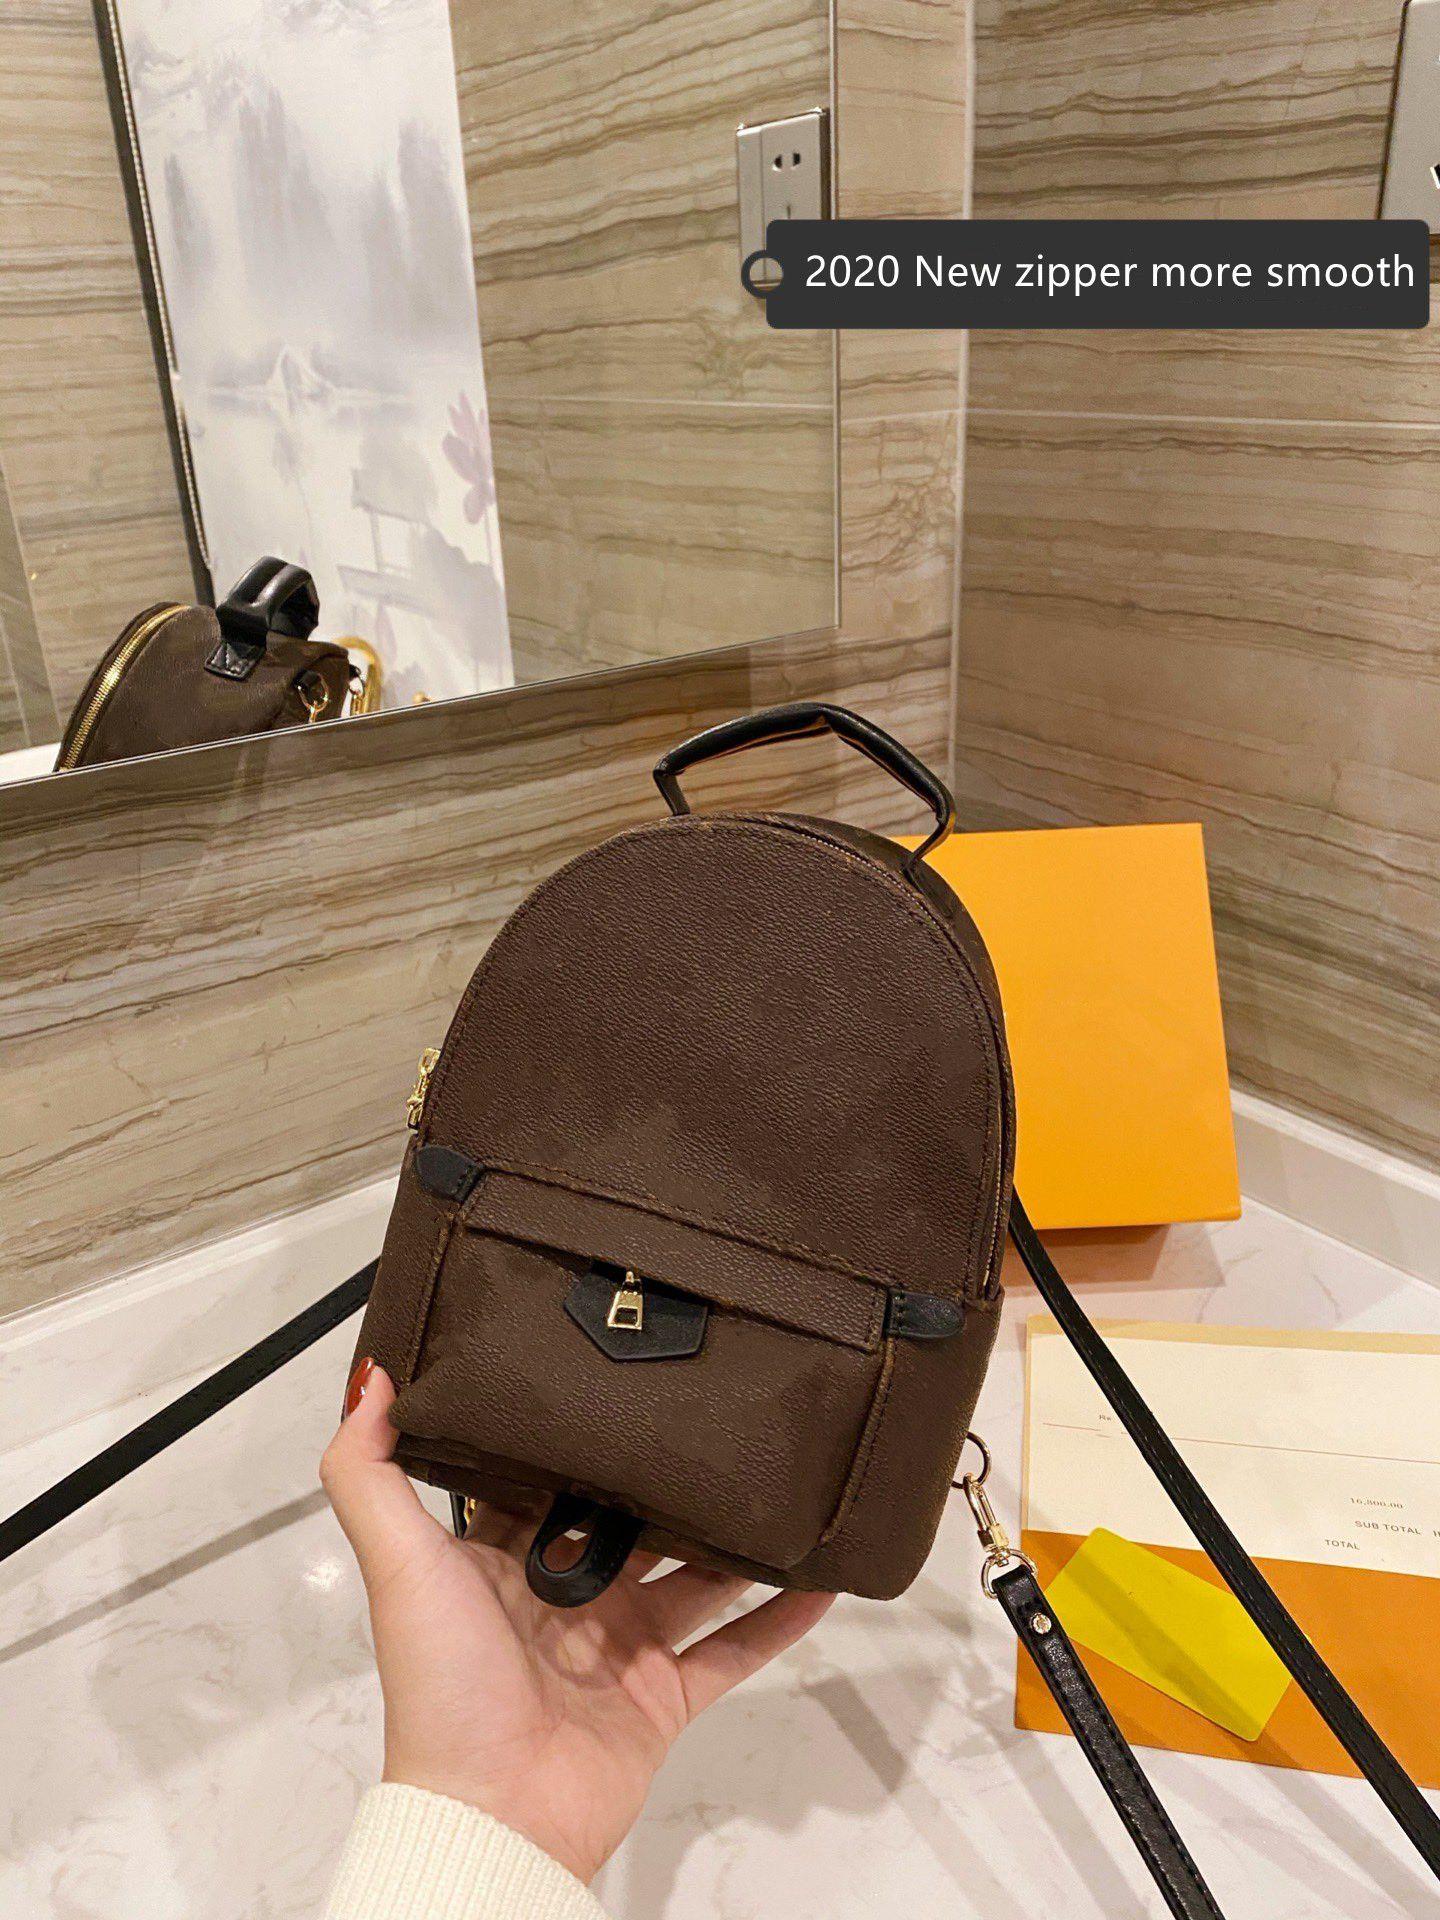 Mini mochila de cuero Mini 2020 mochilas de moda Back Bag Bolso Bolso Presbiliares Pulsera Genuina Hombro Mujeres Bolsos Bolso Cross Bod Lnug